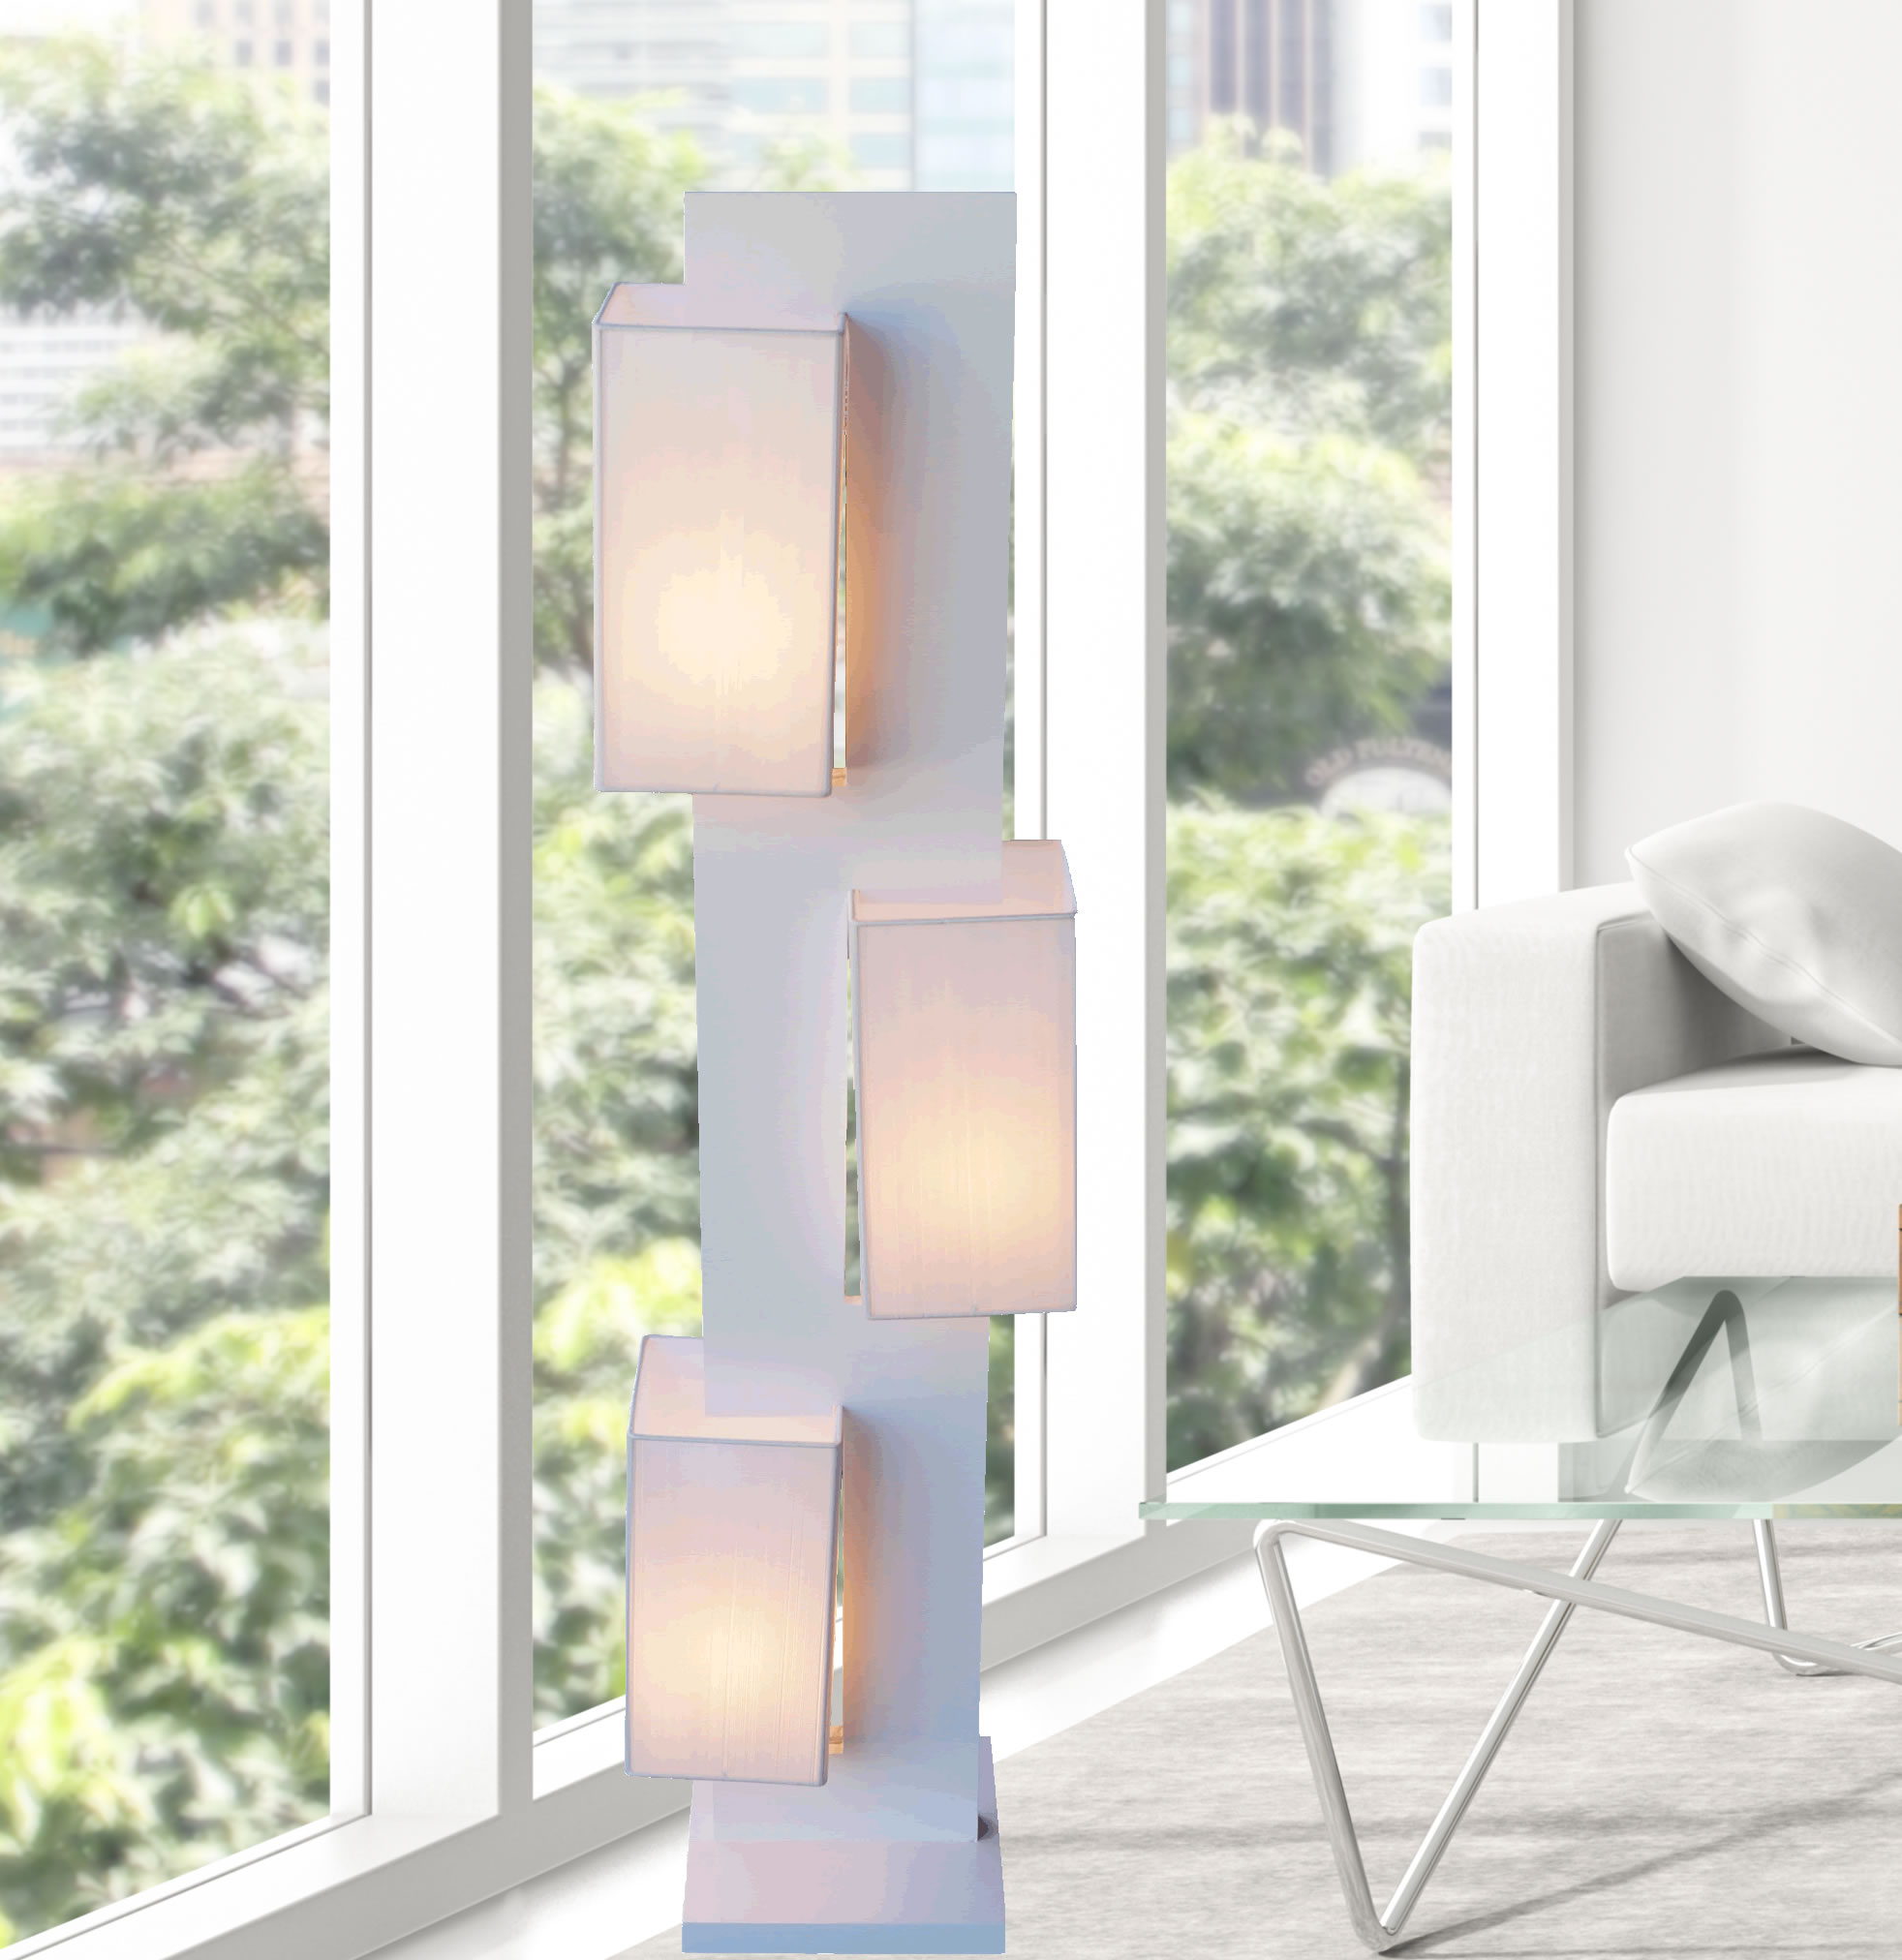 floor lamp zk002l contemporary modern home decor lighting fixtures stylish elegant design - Home Decorating Modern